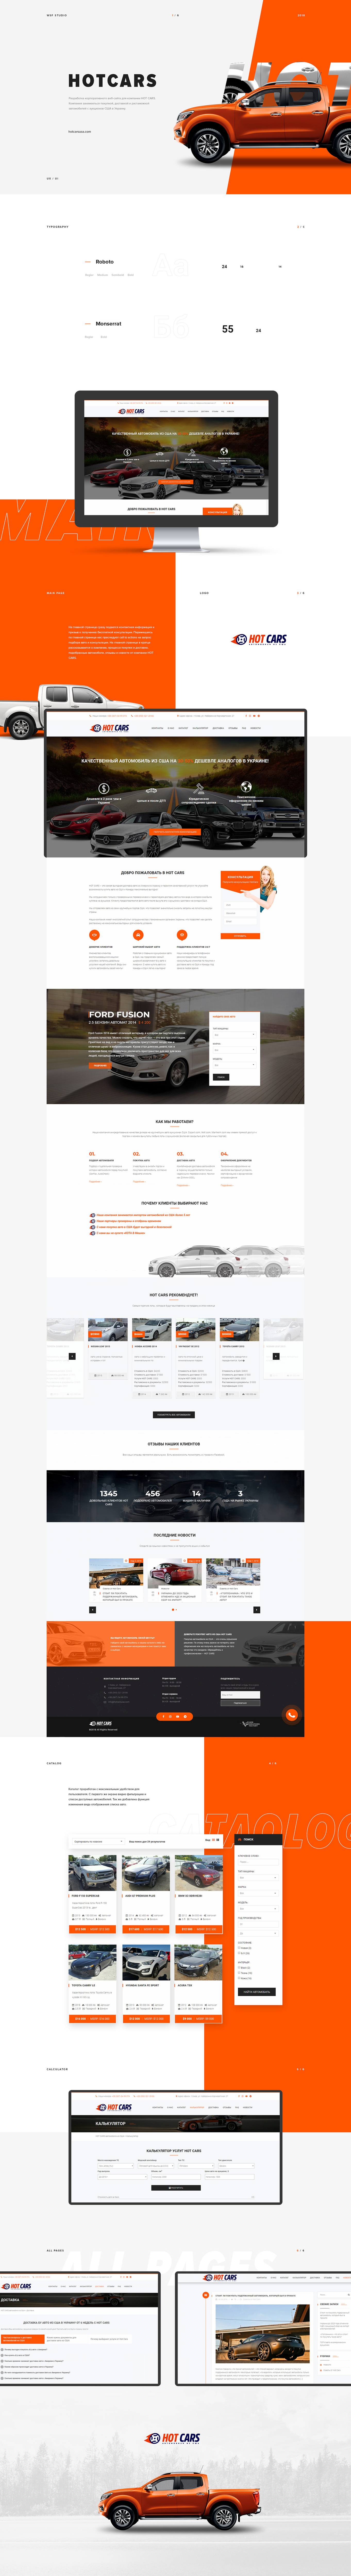 ux UI wsf design Webdesign corporate hotcars Cars car